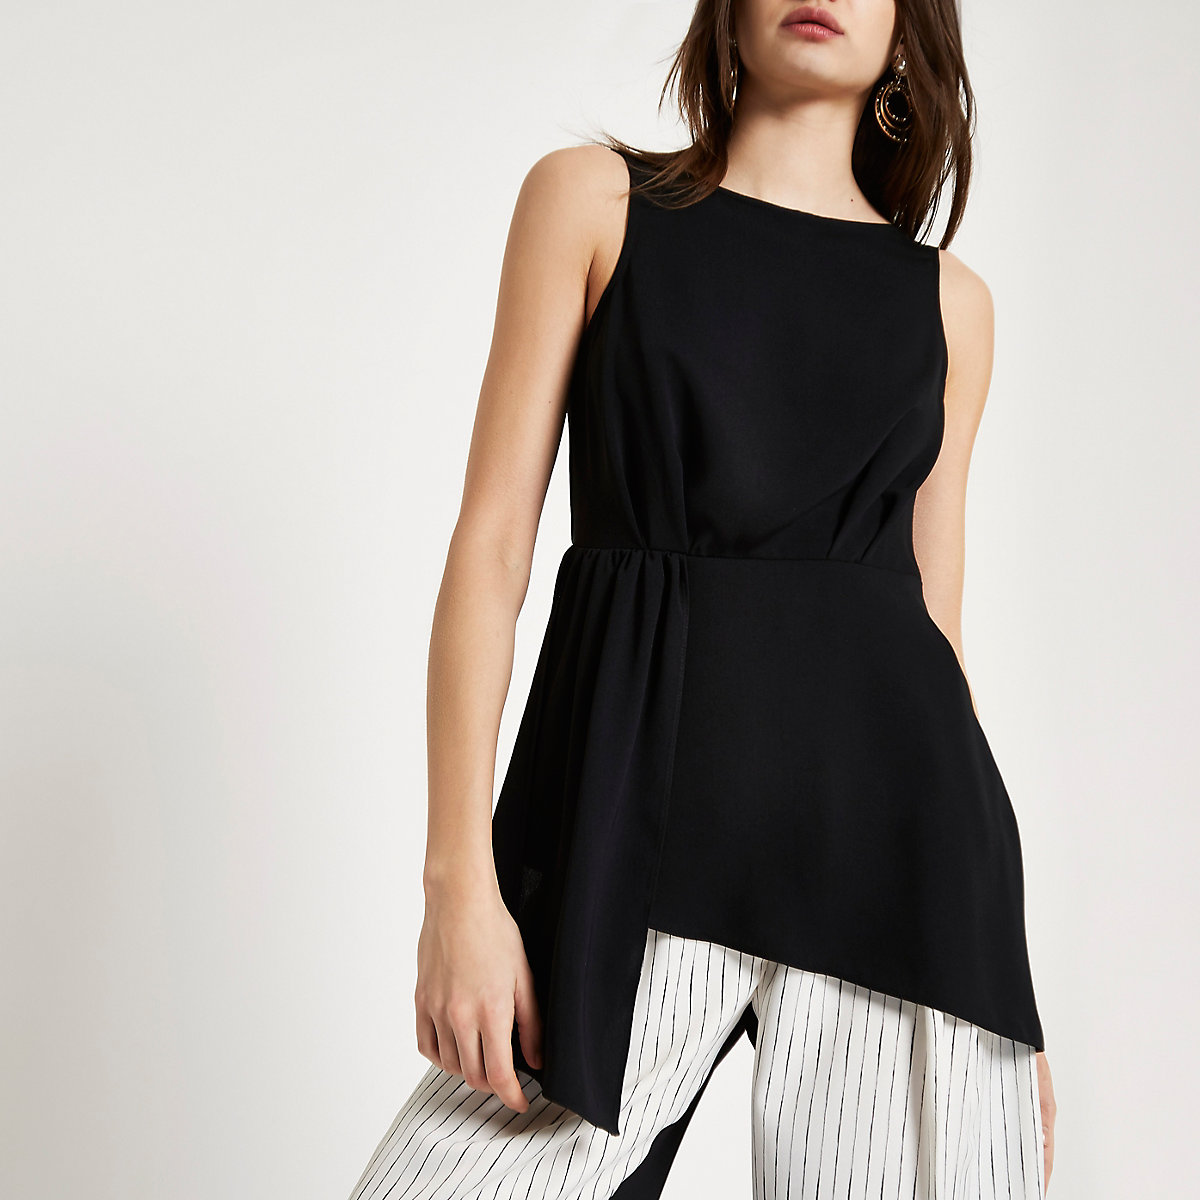 577a7d59bb5d2c Black asymmetric hem sleeveless tunic top - Blouses - Tops - women